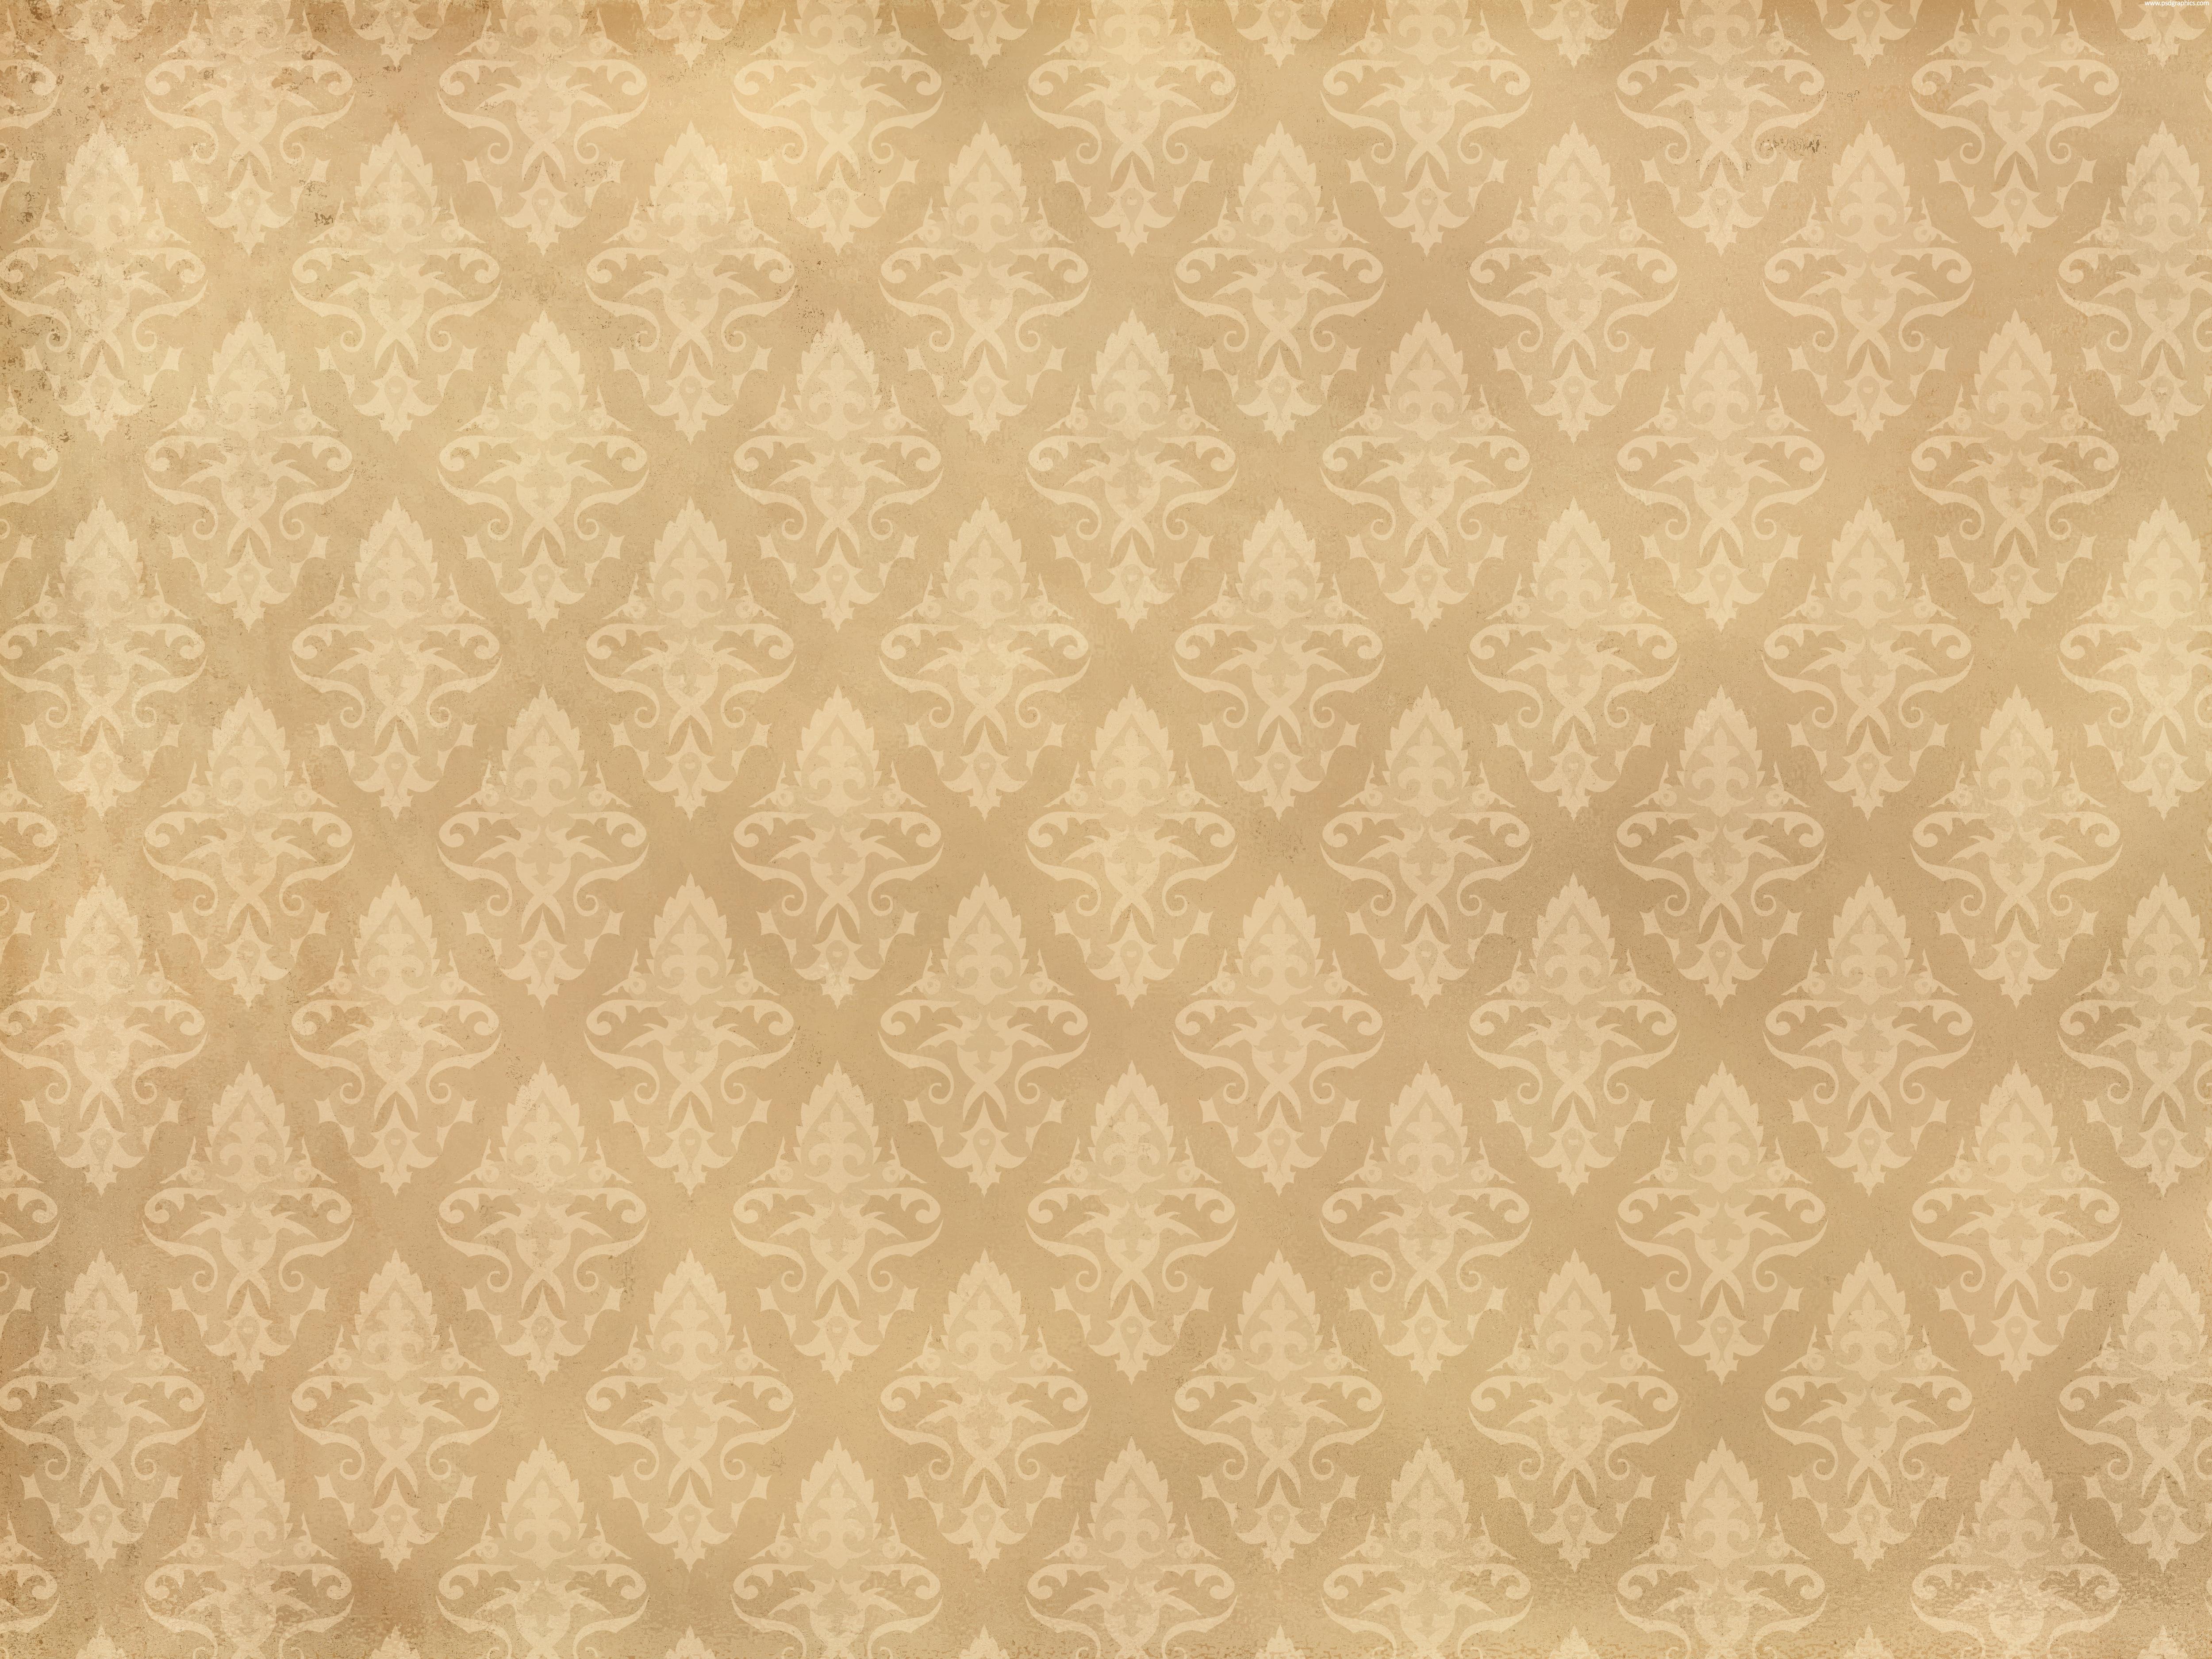 brown antique background antique halftone pattern light brown floral 5000x3750